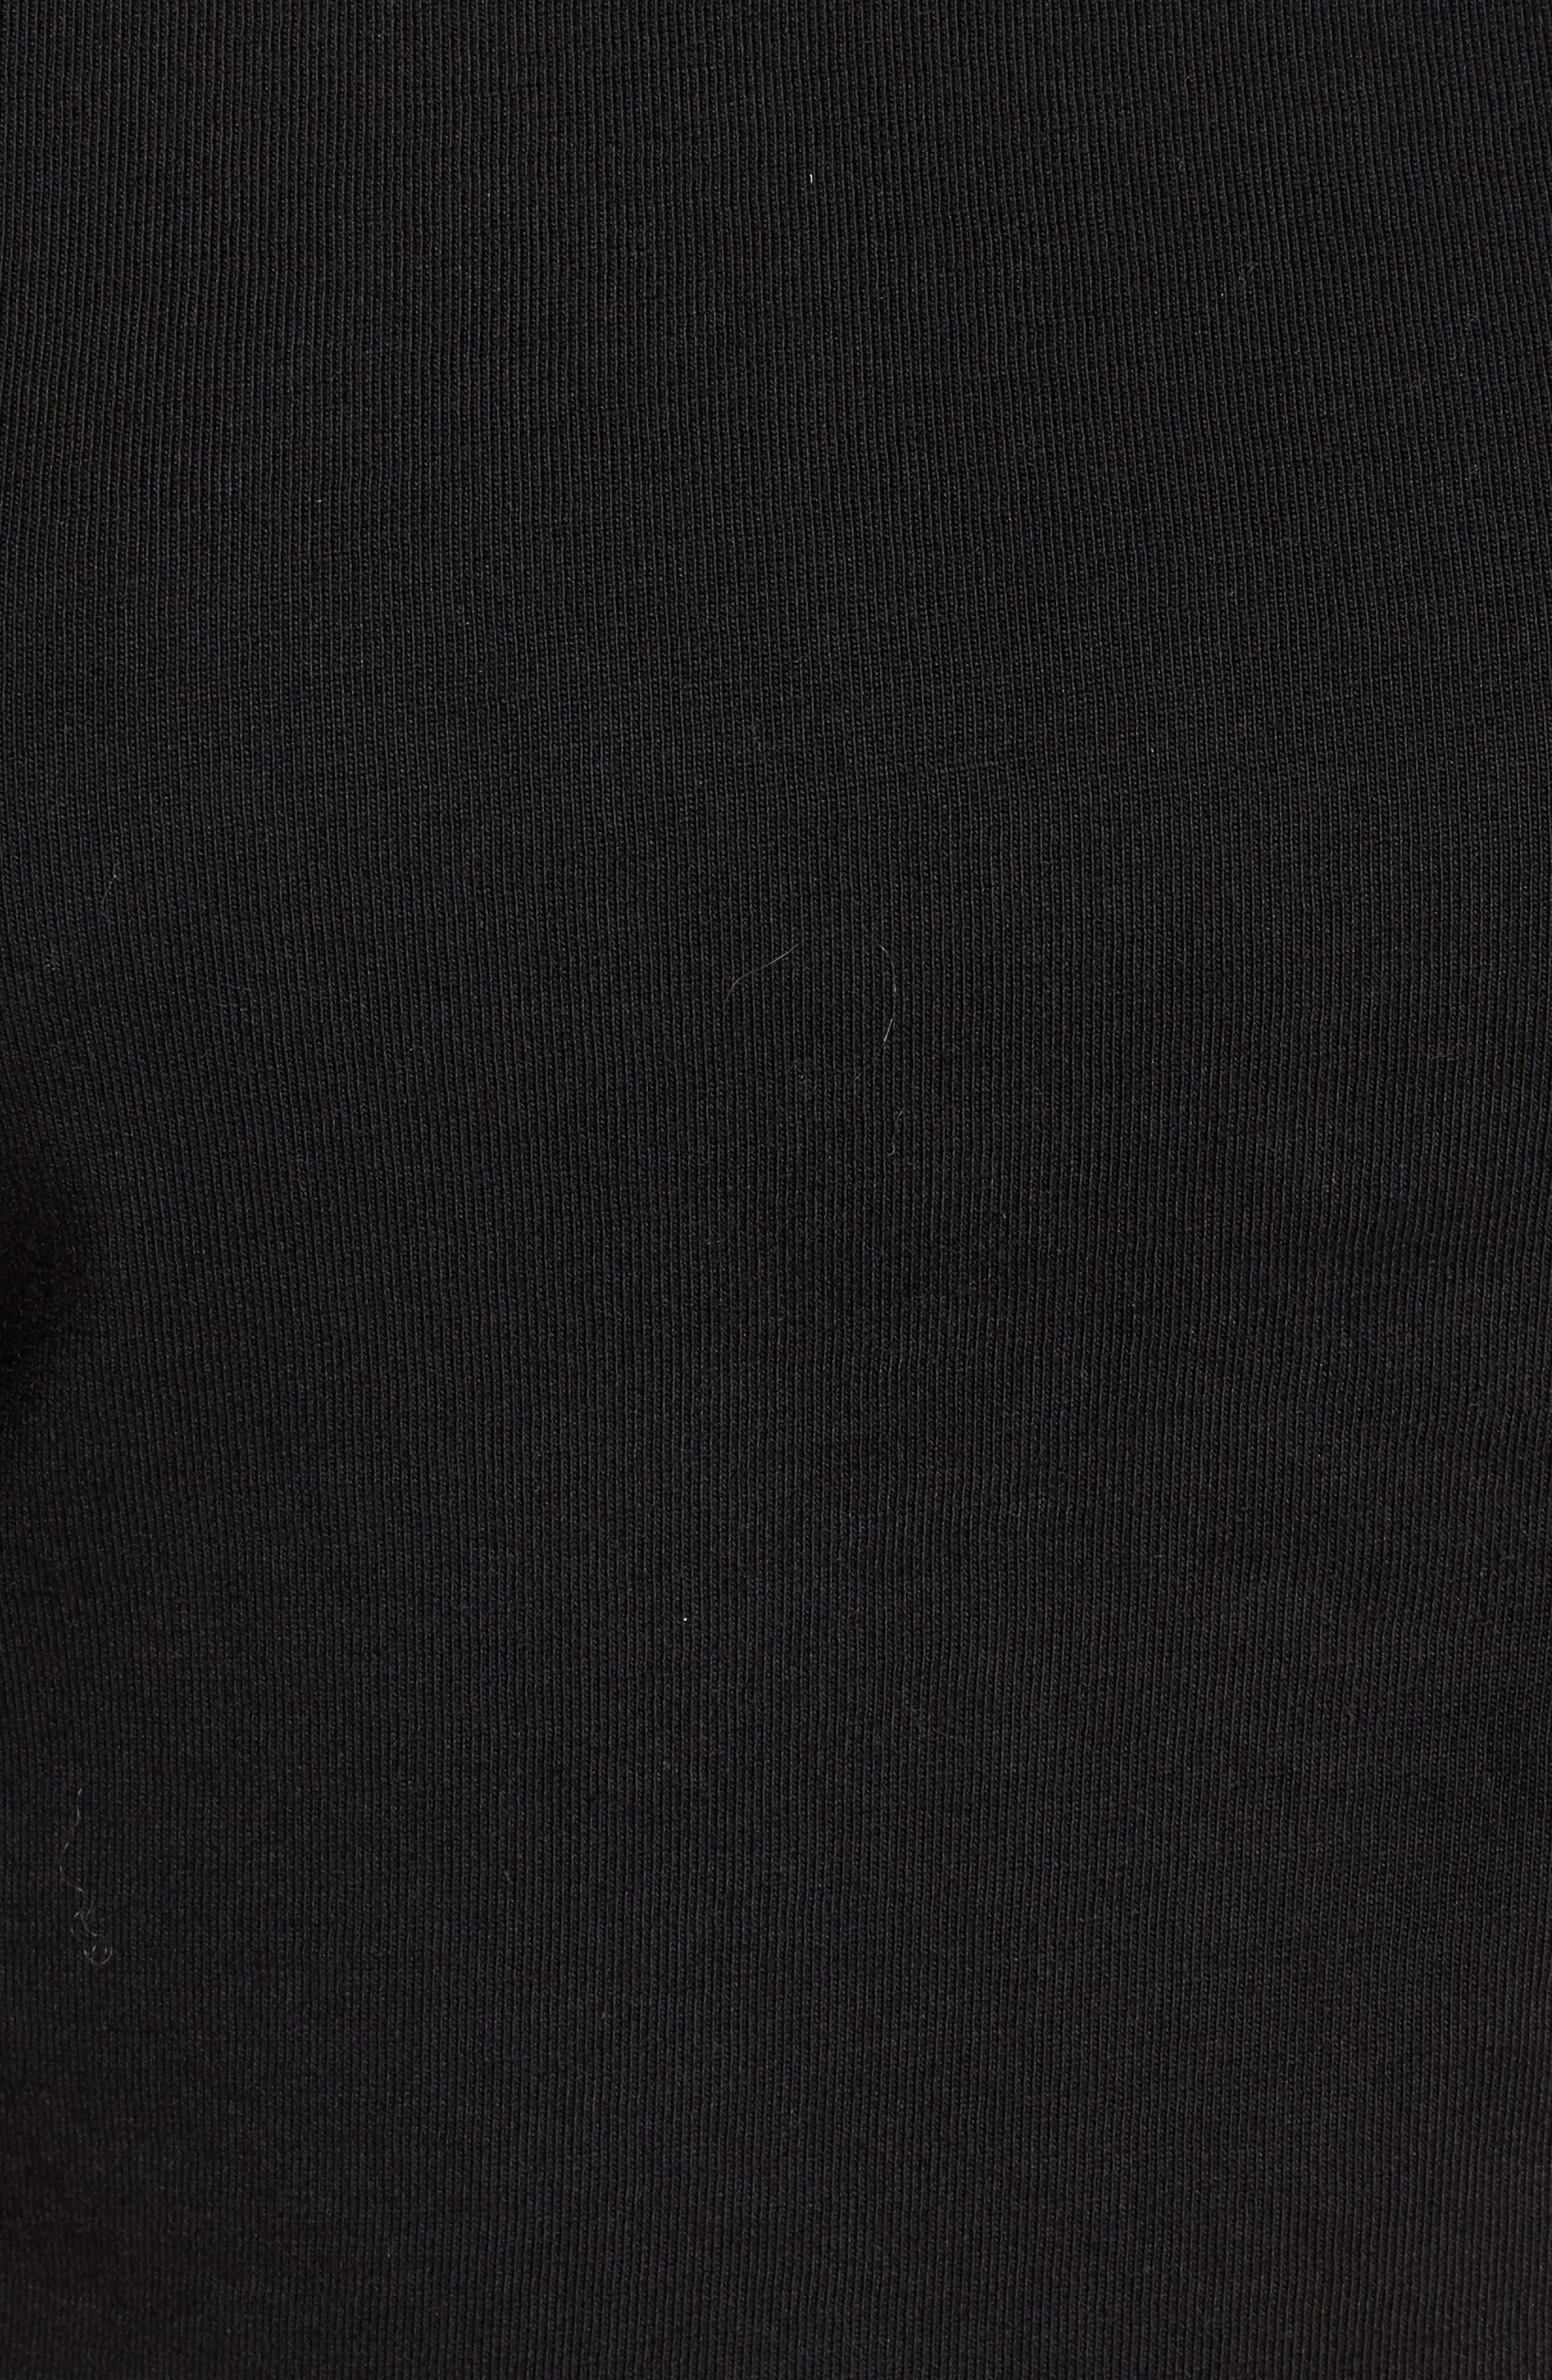 Ruffle Sleeve Tee,                             Alternate thumbnail 6, color,                             001